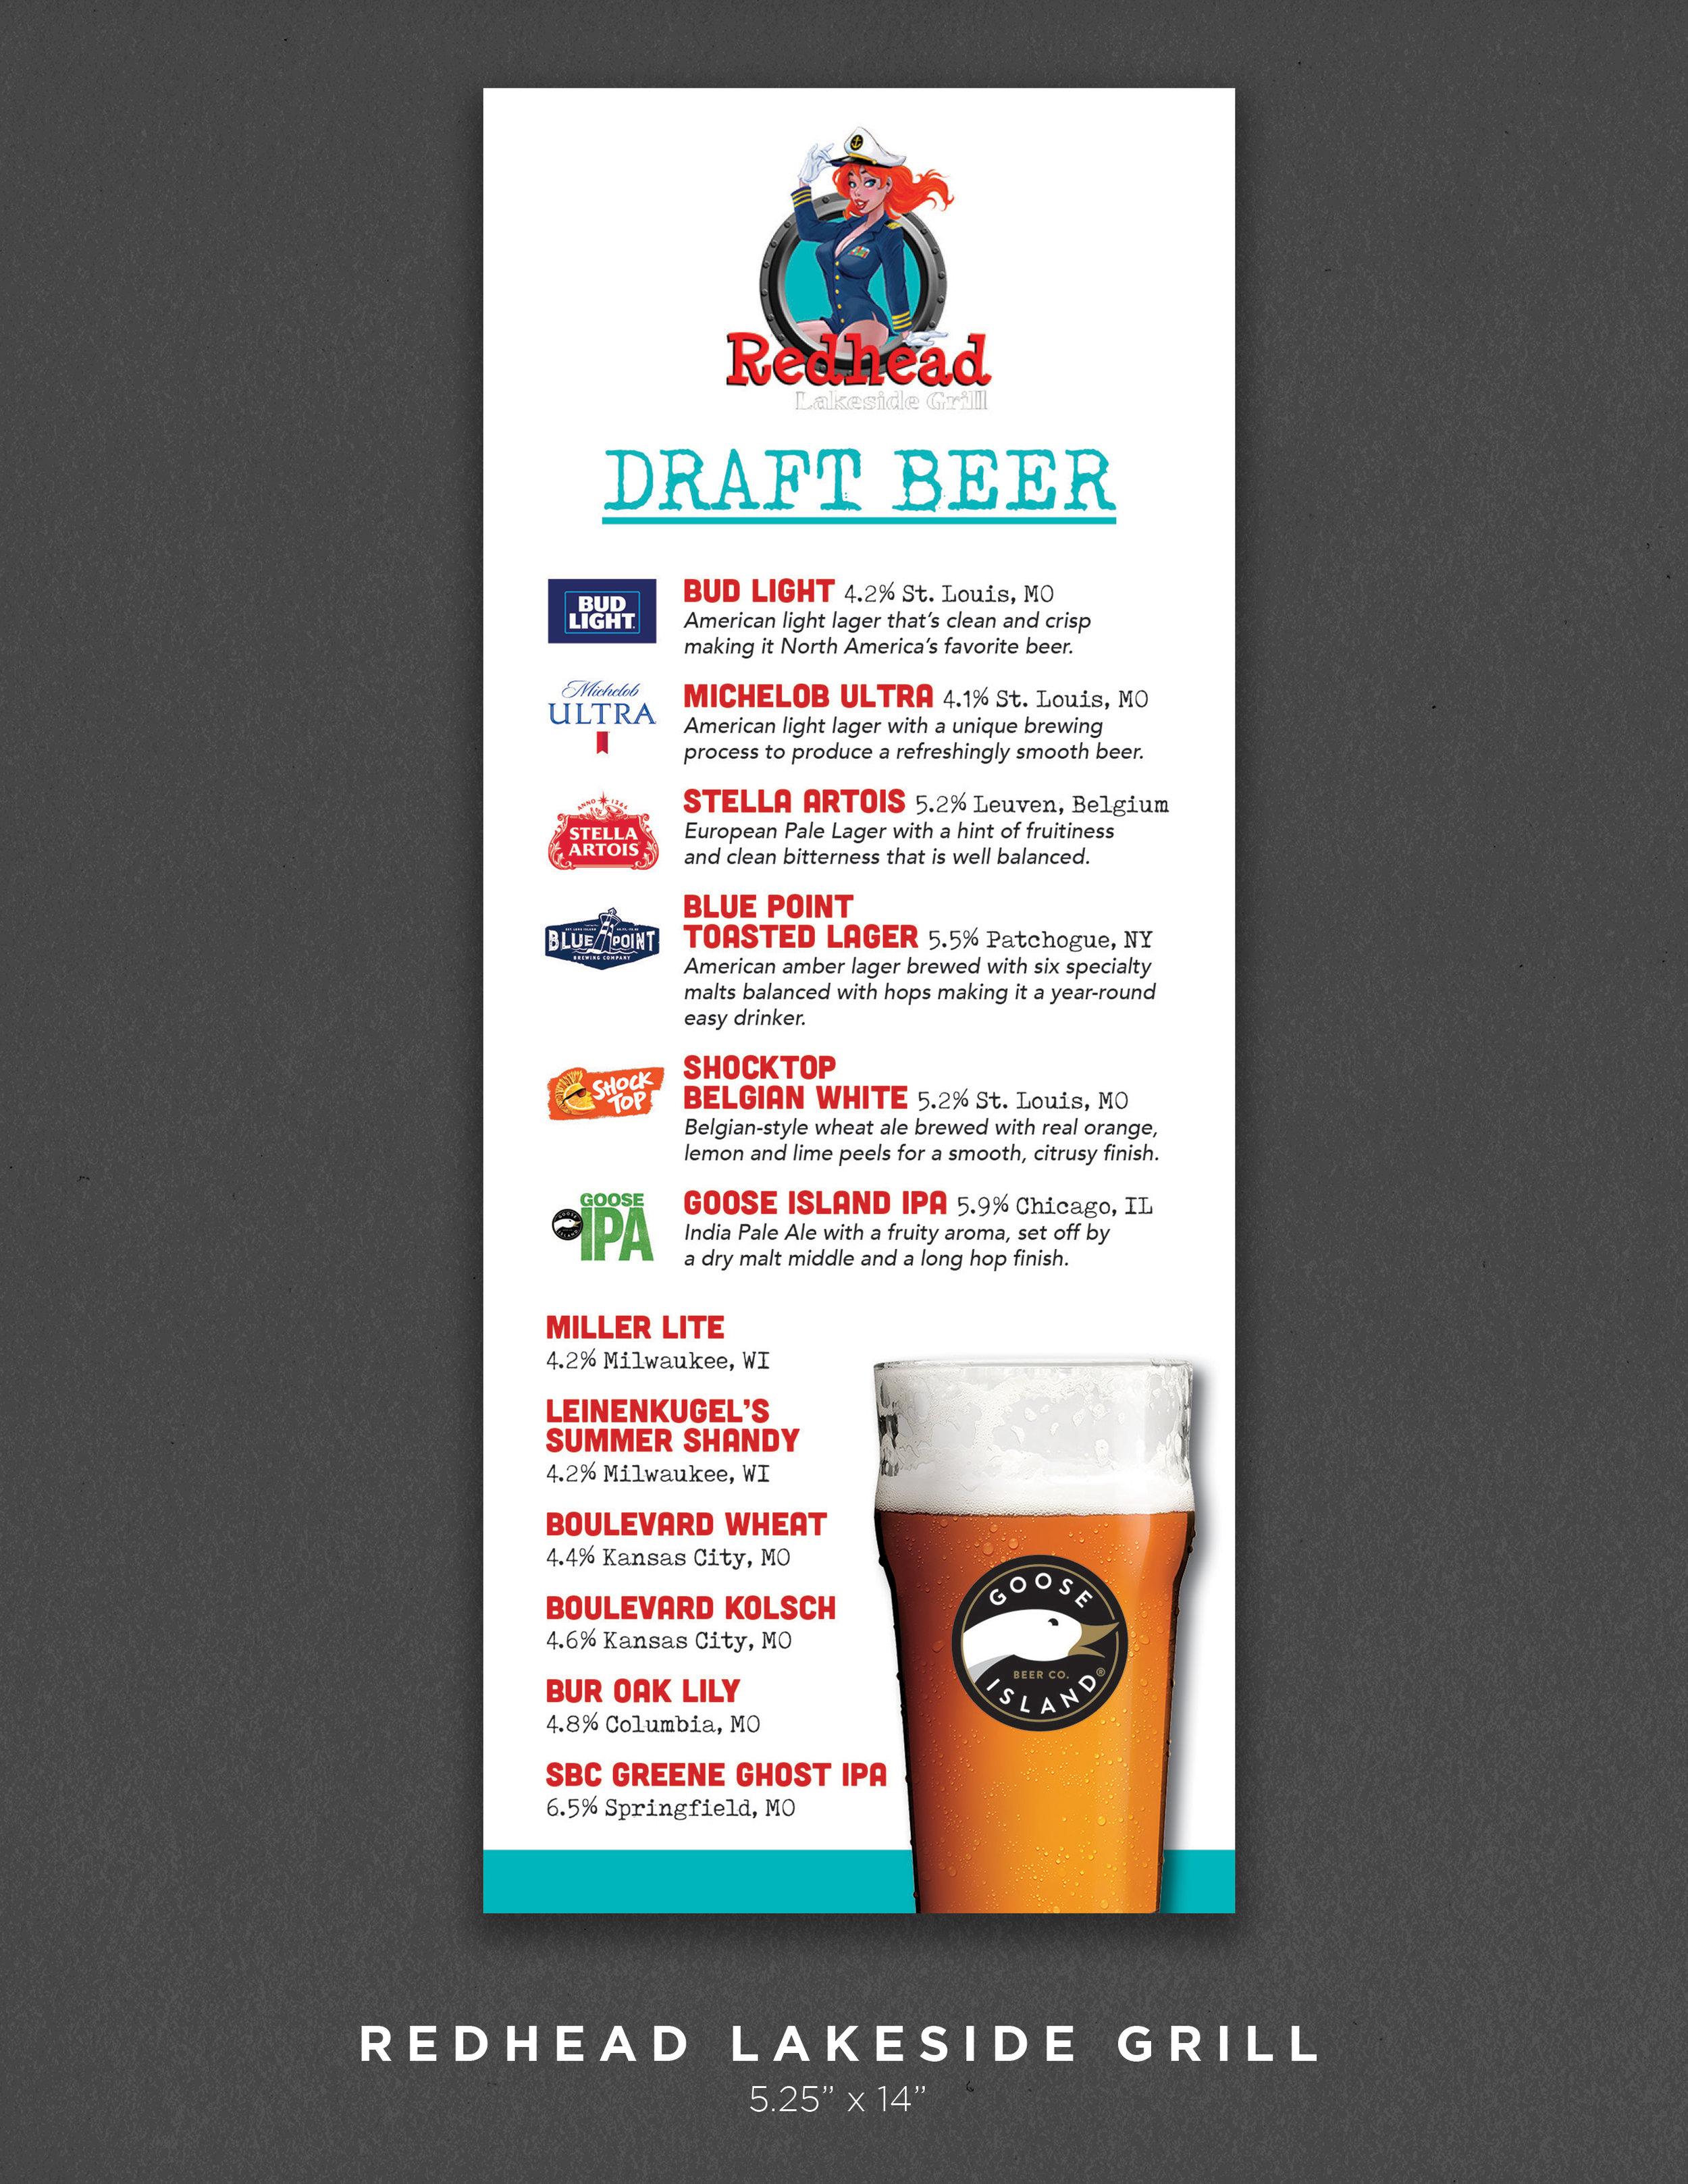 Redhead Lakeside Grill.jpg